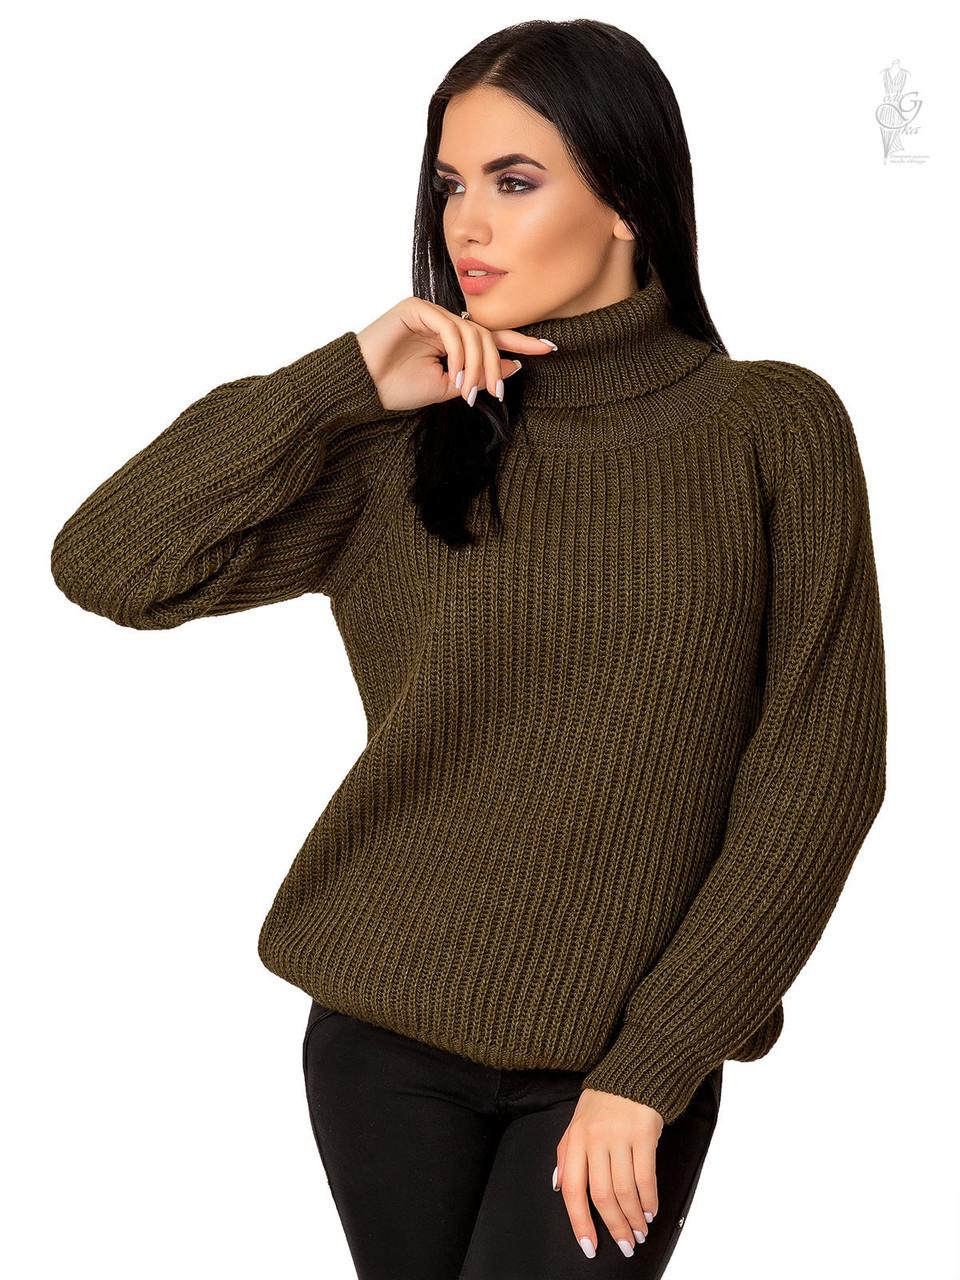 Женский свитер оверсайз Мара из шерсти и акрила